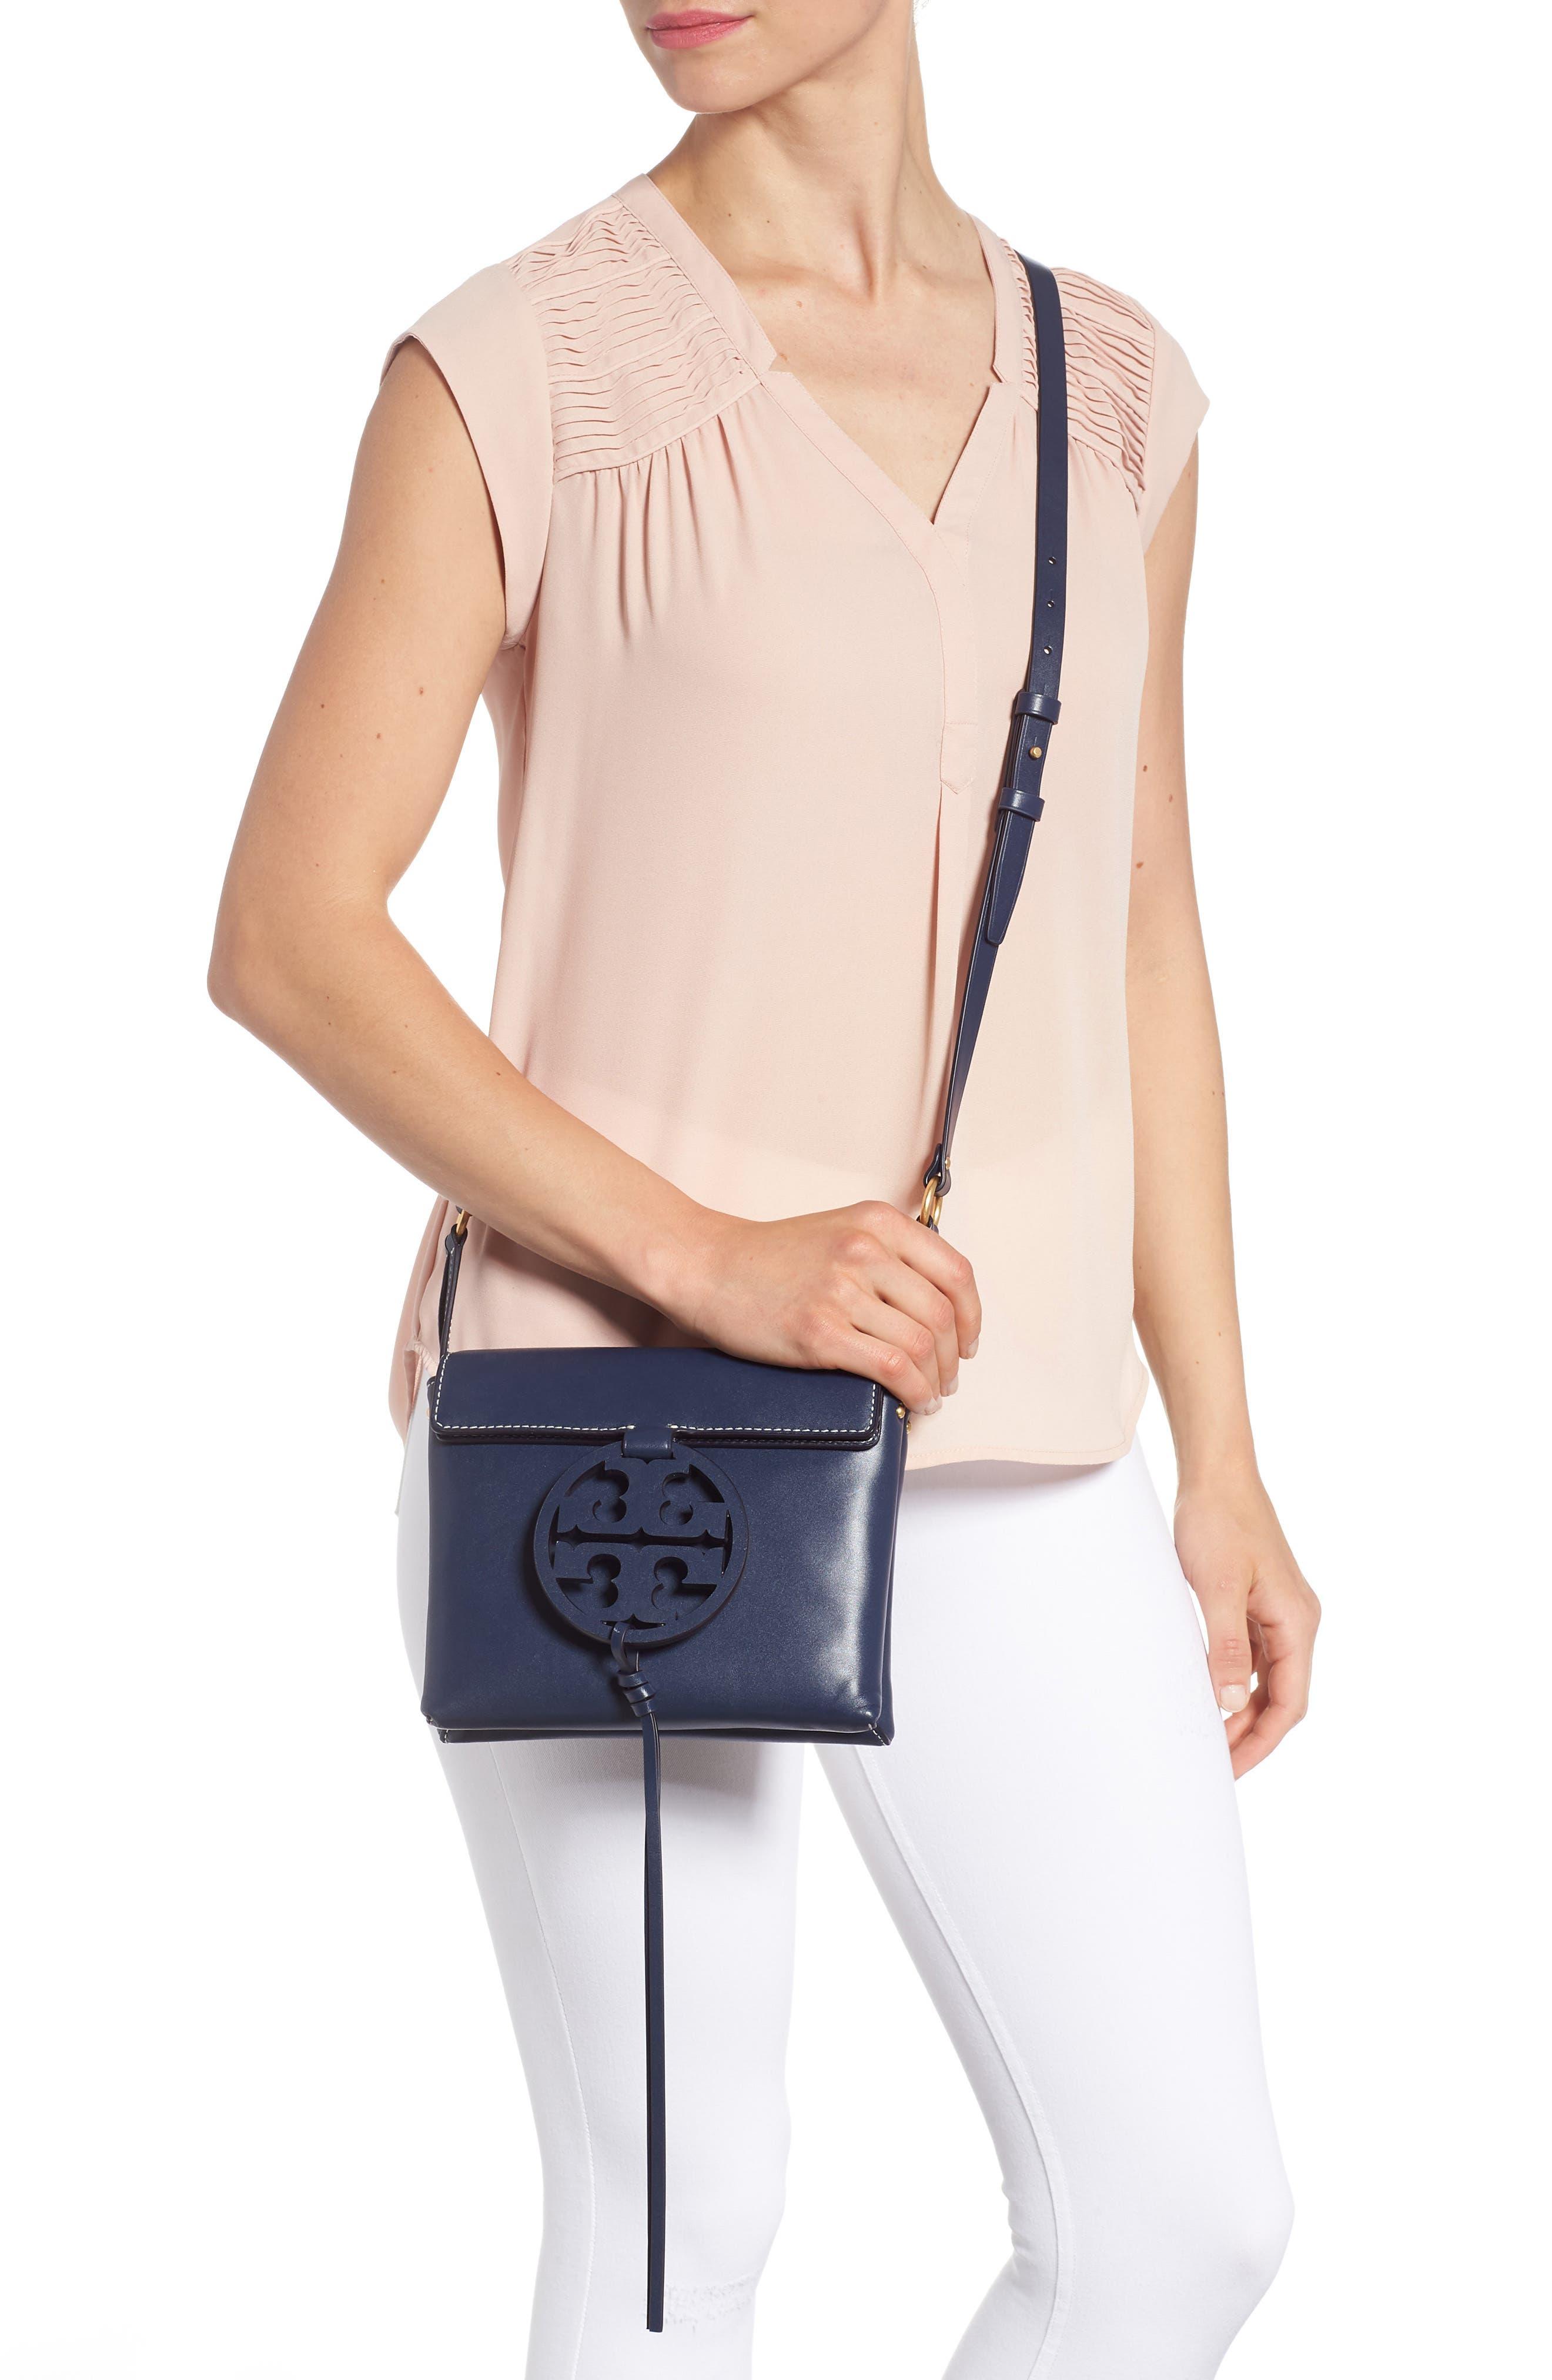 Miller Leather Crossbody Bag,                             Alternate thumbnail 2, color,                             ROYAL NAVY